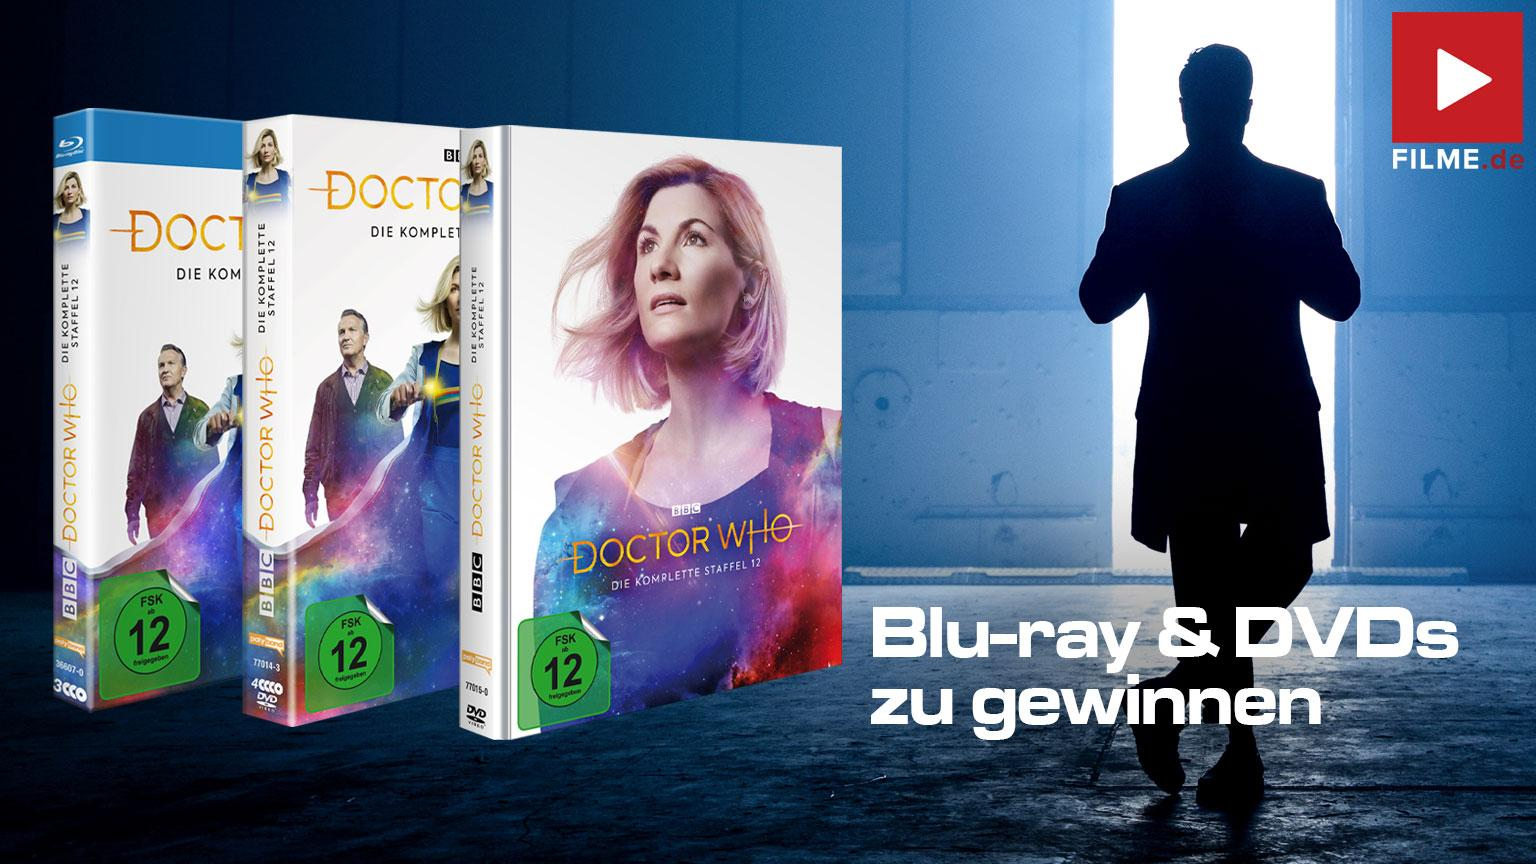 Dr. Who Staffel 12 Mediabook DVD Blu-ray Serie gewinnspiel gewinnen shop kaufen Artikelbild